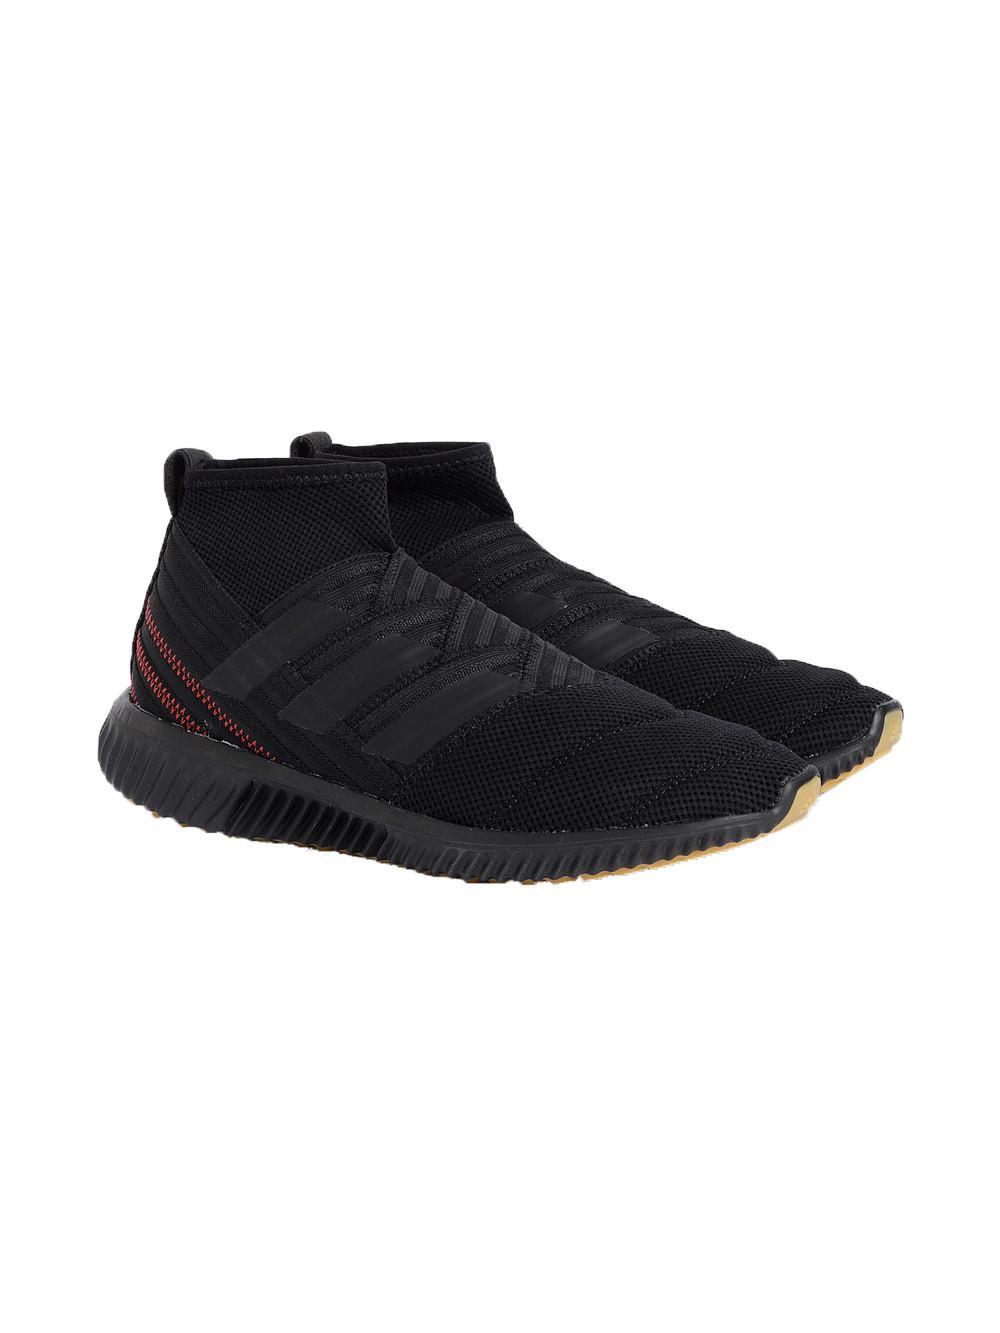 Nemeziz Lyst Adidas negro mediados de TR zapatillas en negro para hombres